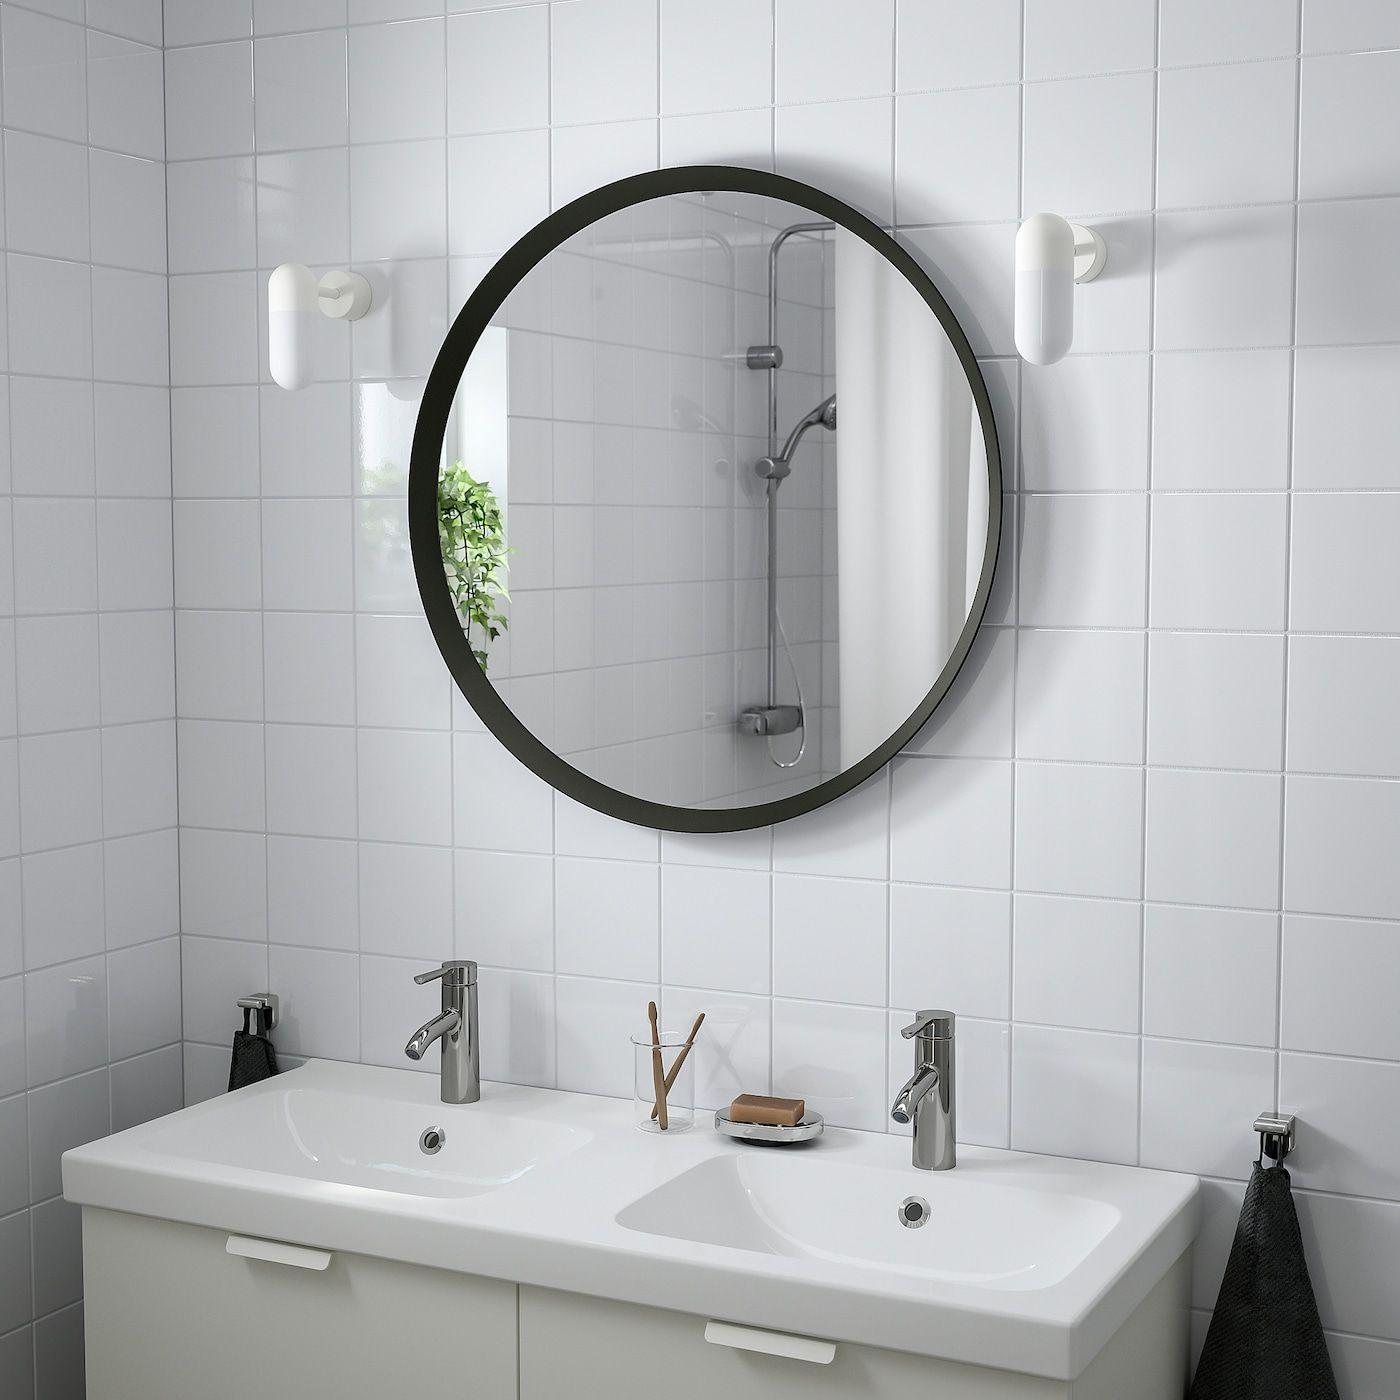 LANGESUND Mirror - dark gray - IKEA in 6  Mirror wall bathroom